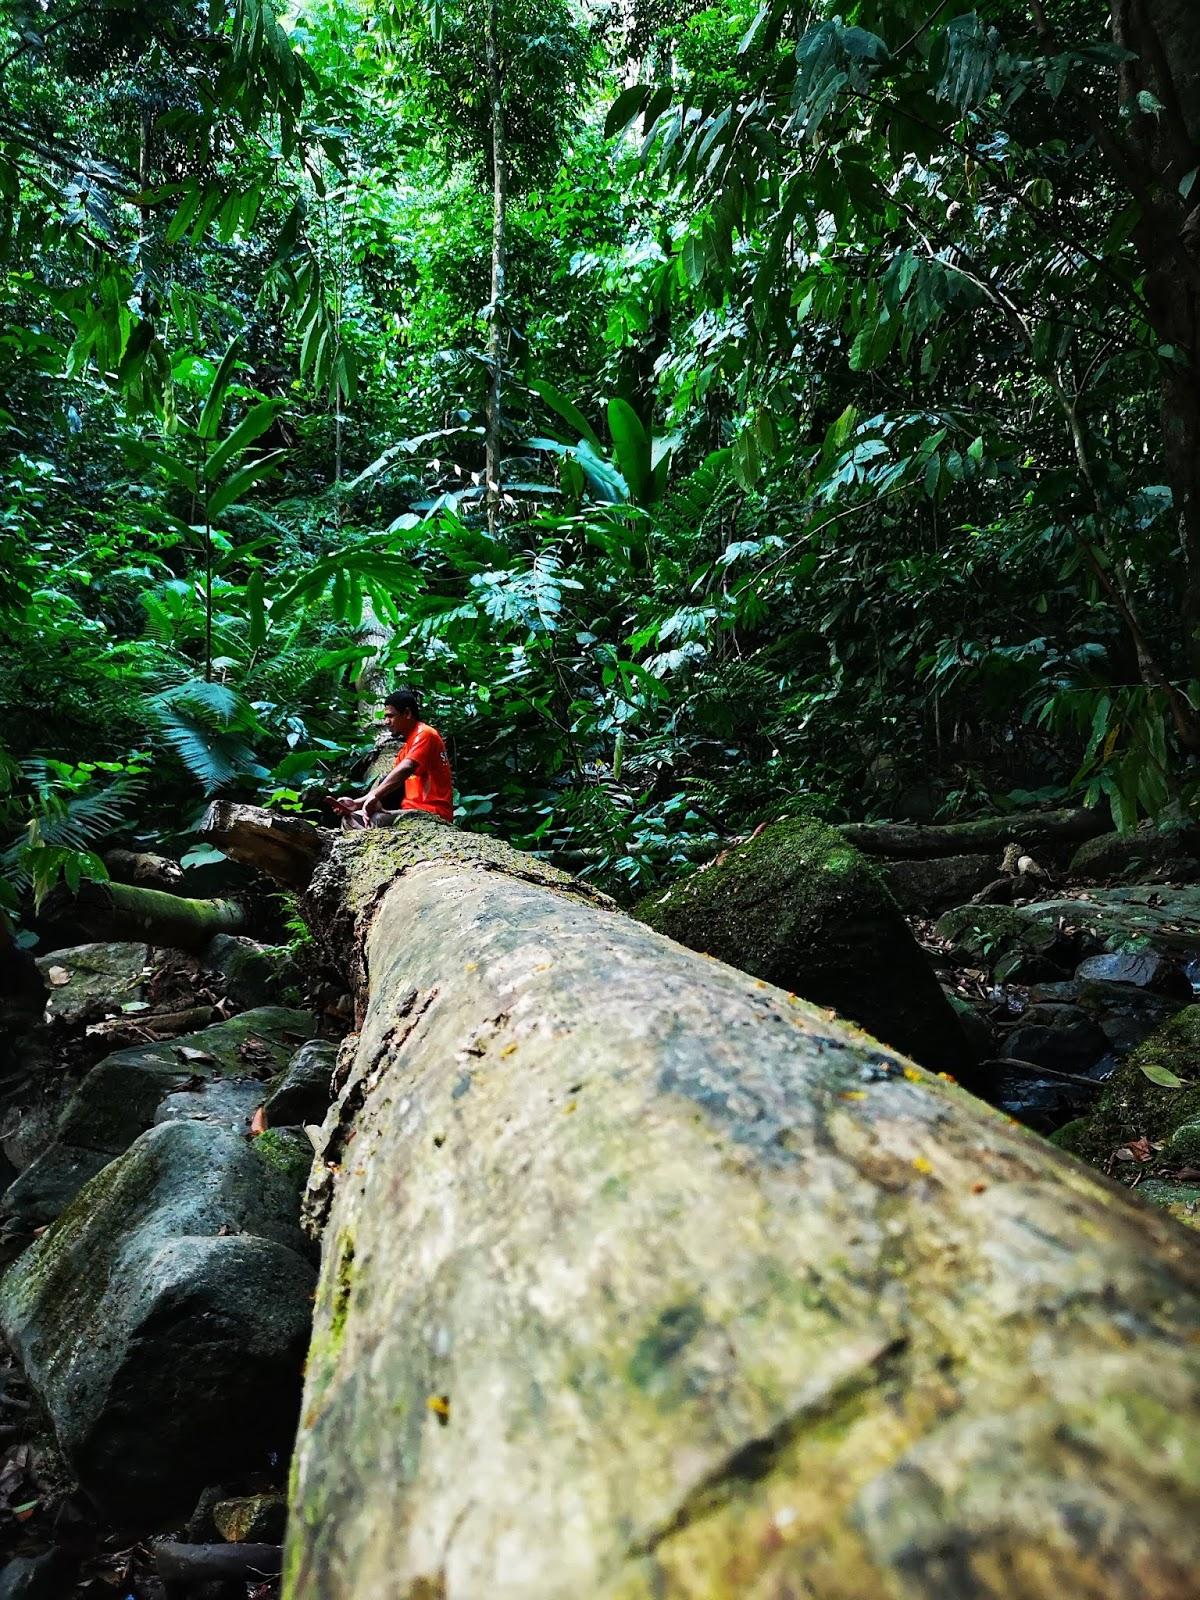 Mendaki Gunung Telapak Buruk & Gunung Berembun, Jelebu 3